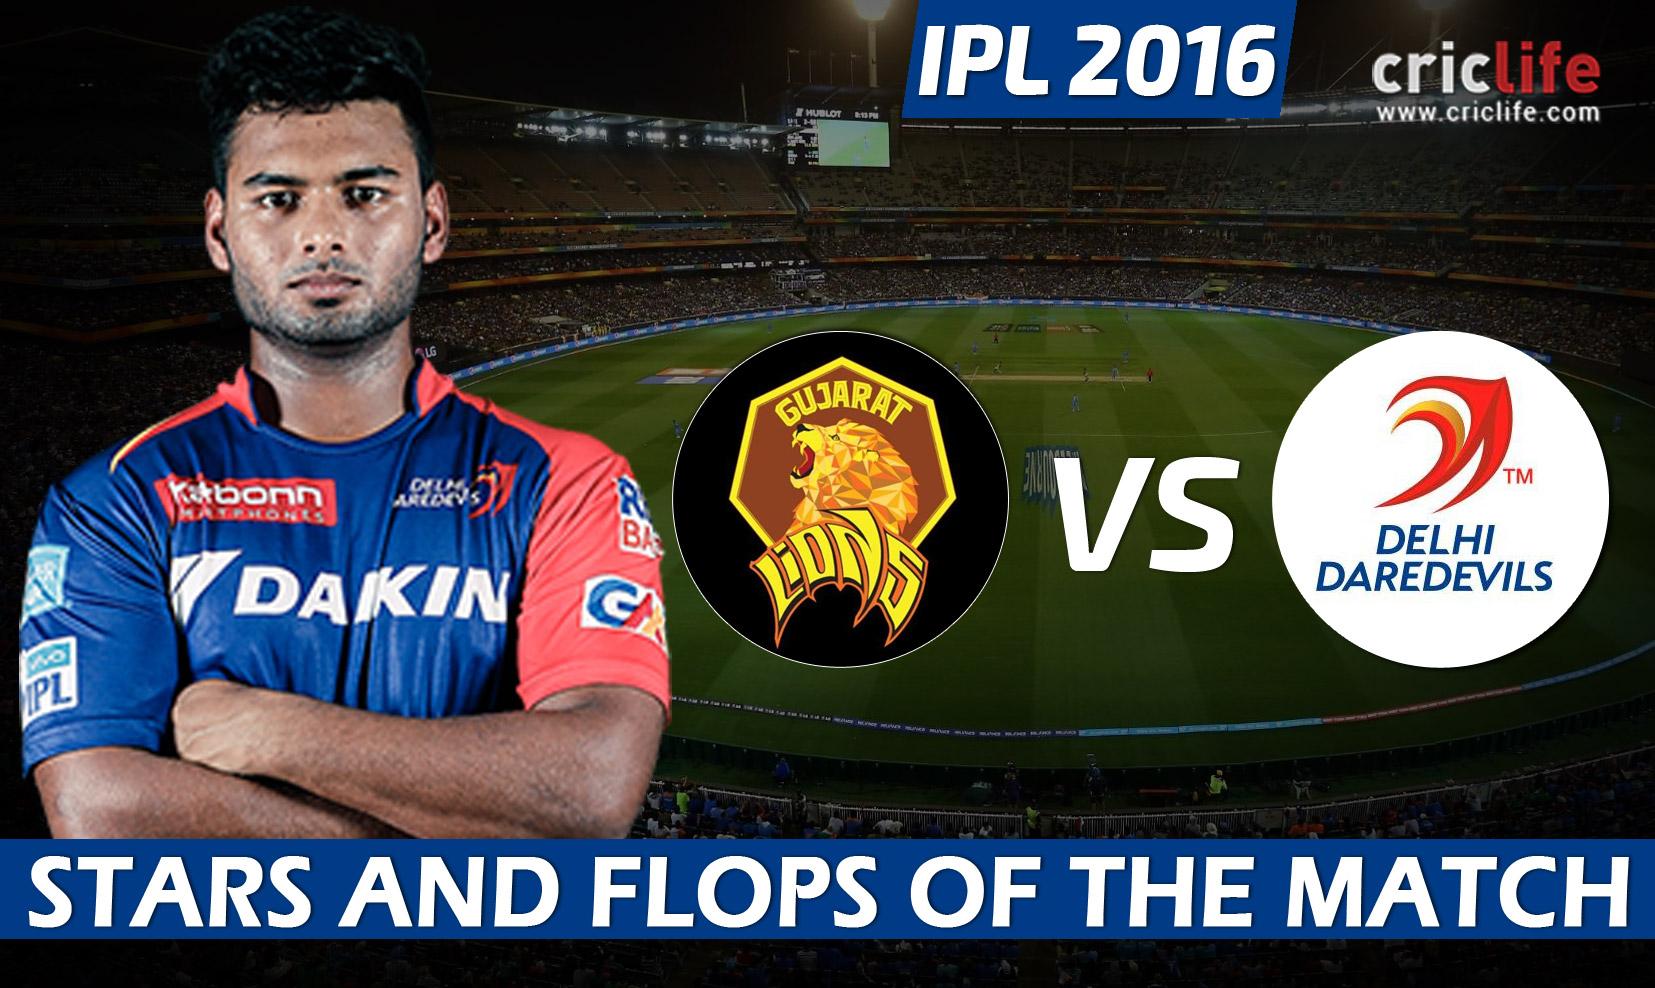 IPL 2016: Delhi Daredevils beat Gujarat Lions by 8 wickets at Rajkot